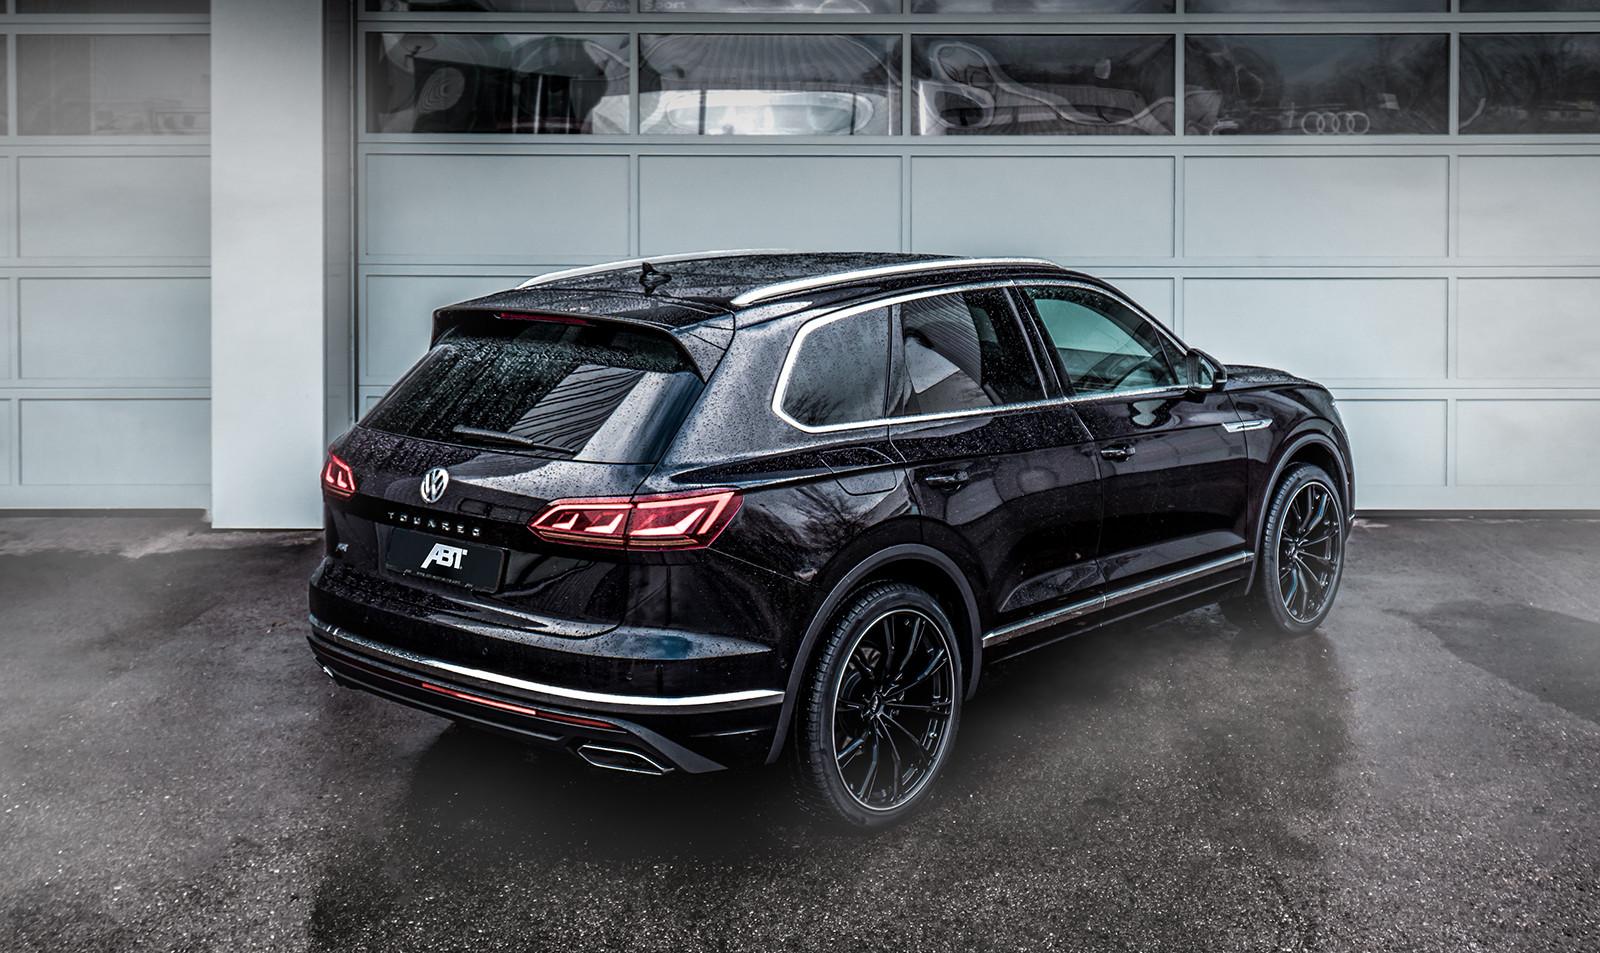 Foto de ABT Volkswagen Touareg 2018 (2/6)